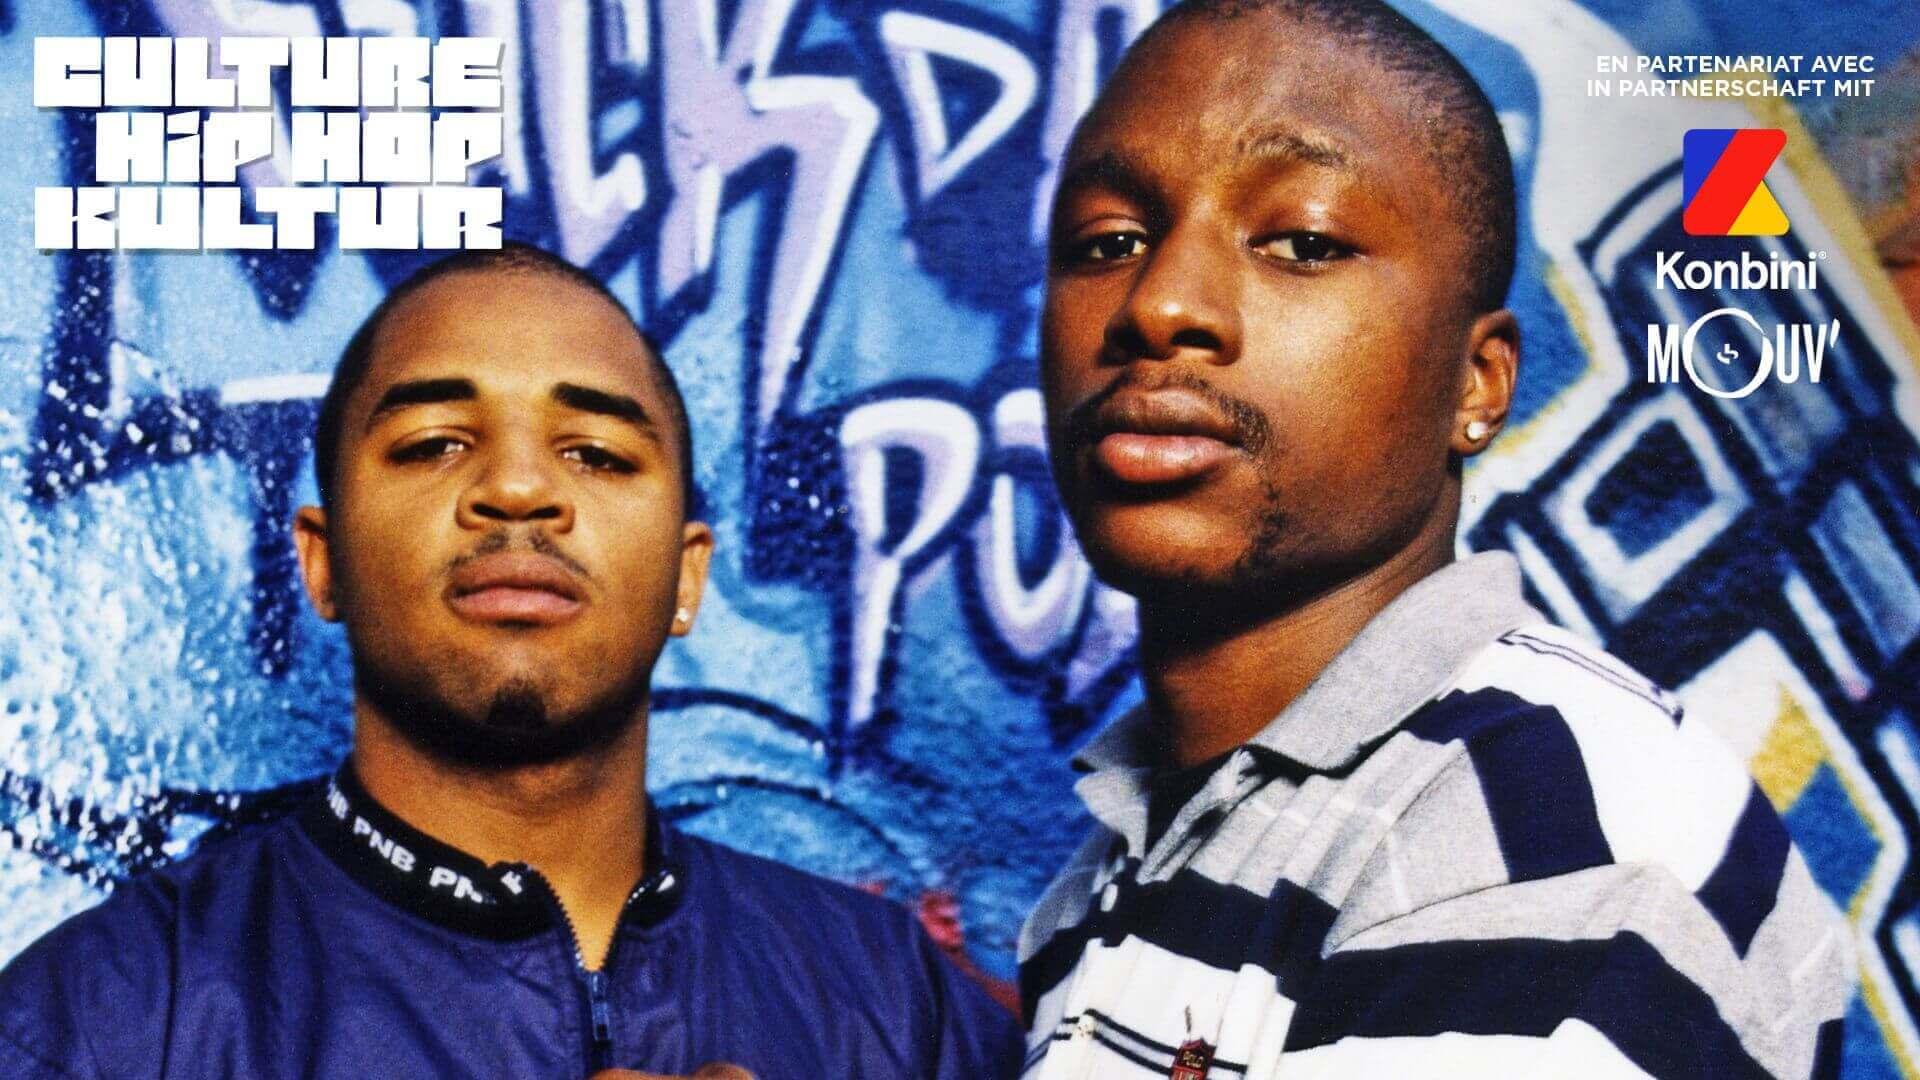 time-bomb-histoire-hip-hop-documentaire